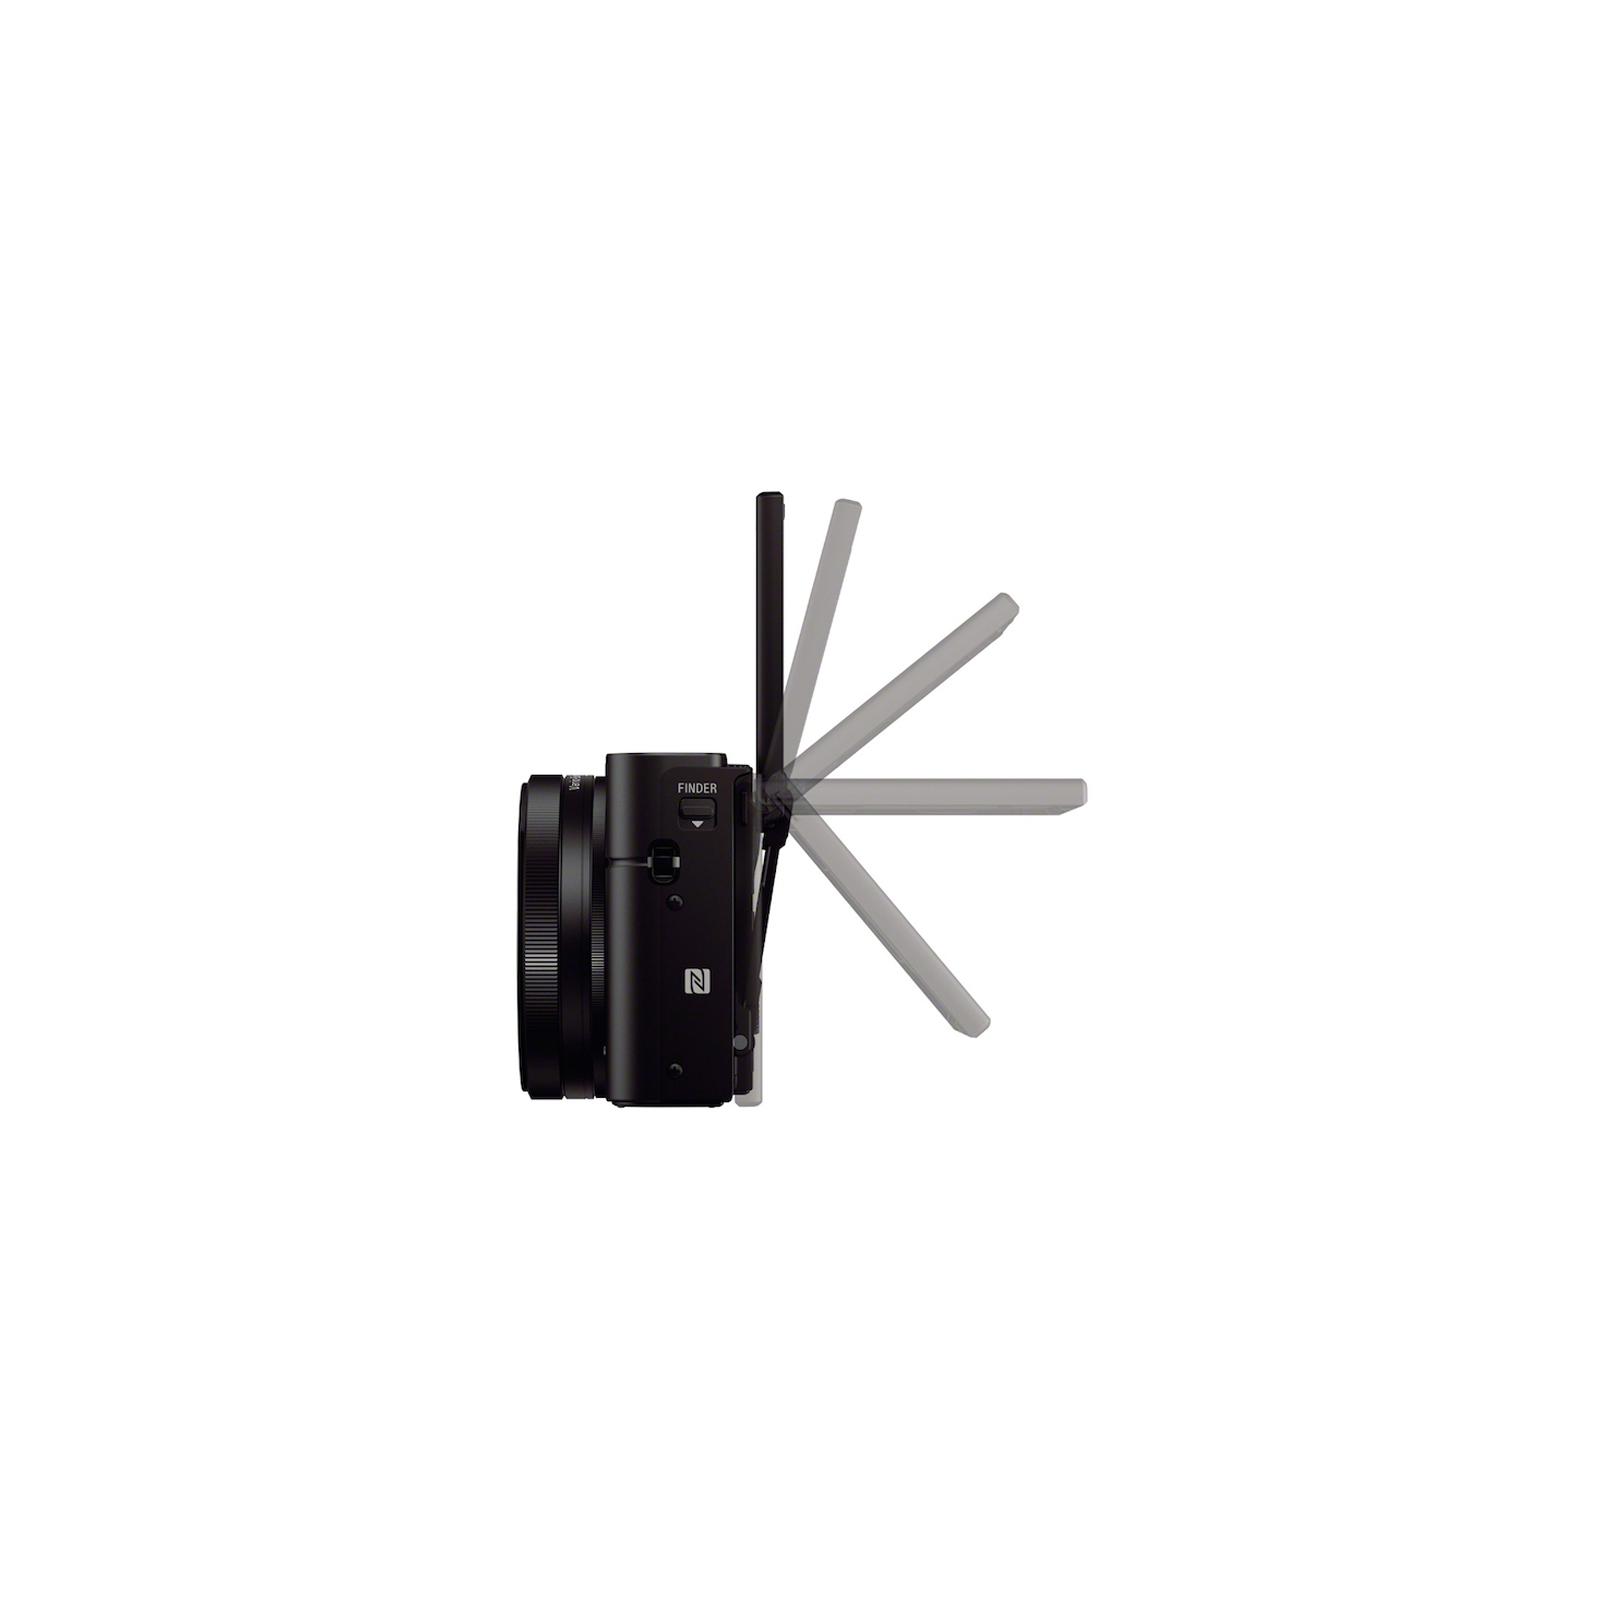 Цифровий фотоапарат SONY Cyber-shot DSC-RX100 Mark III (DSCRX100M3.RU3) зображення 8